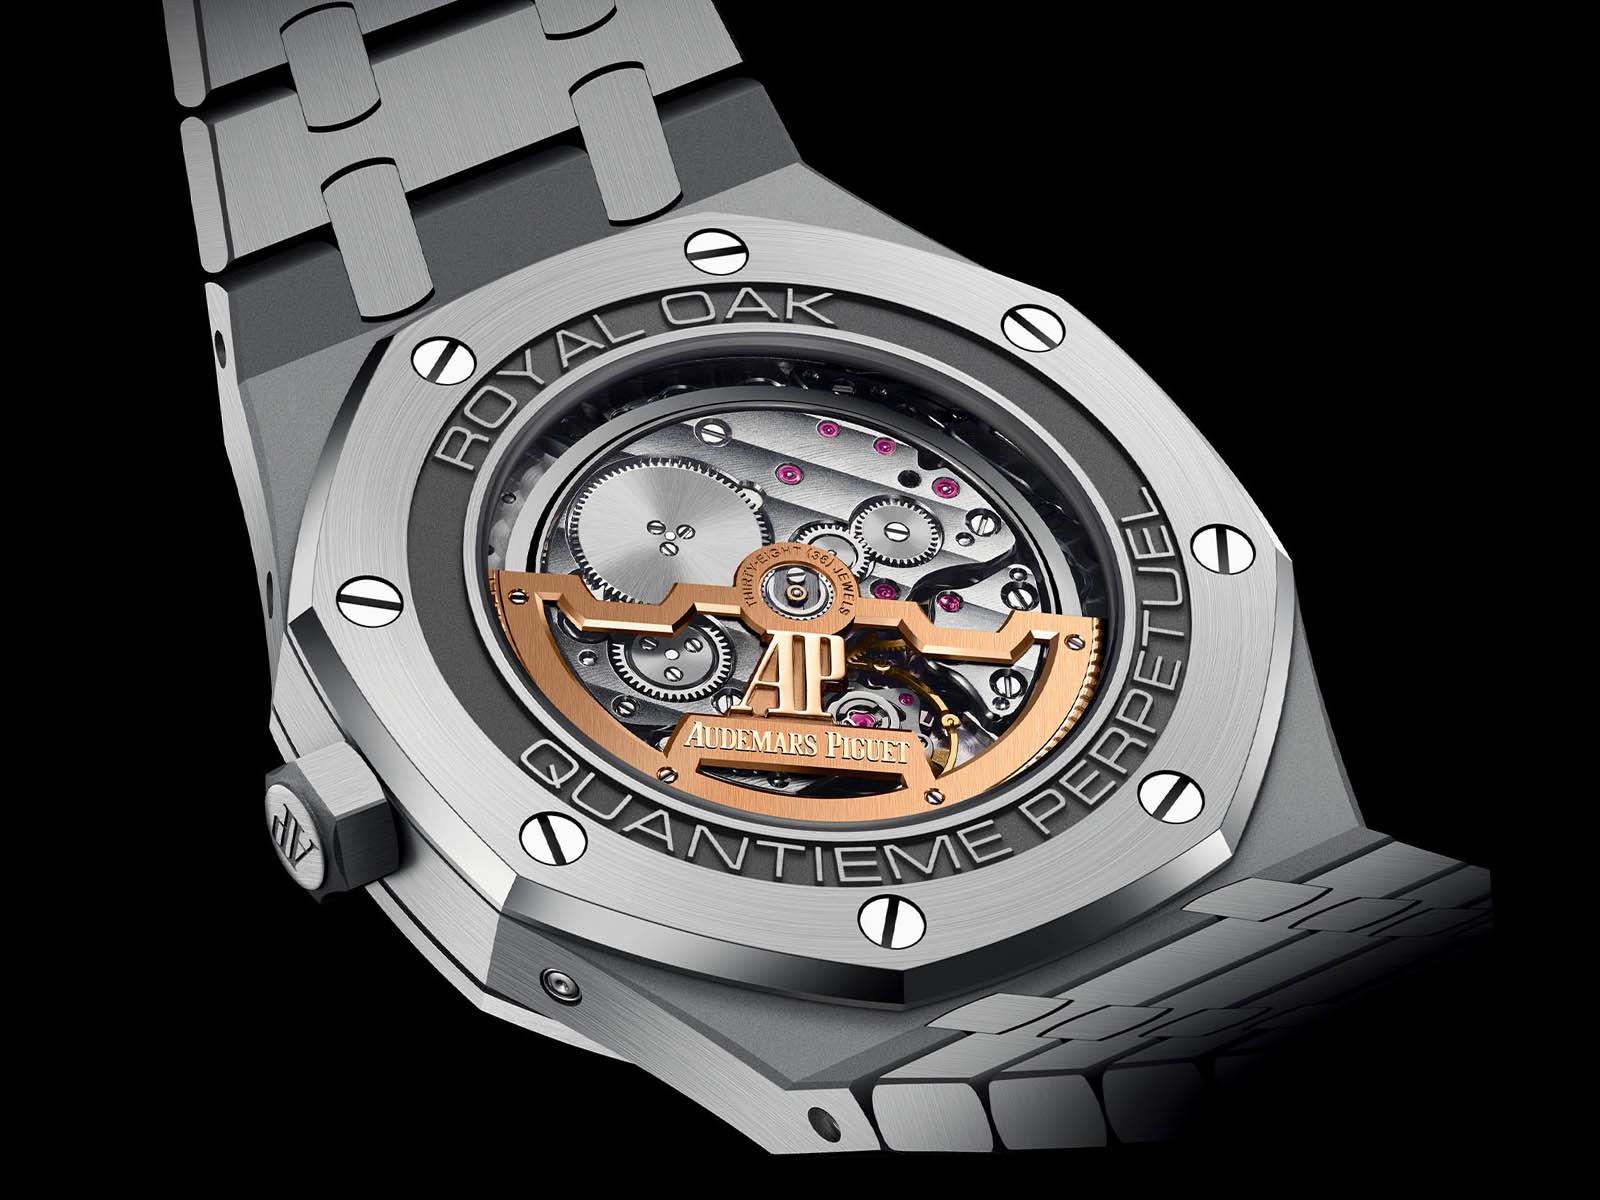 26574ti-oo-1220ti-01-audemars-piguet-royal-oak-perpetual-calendar-titanium-5.jpg